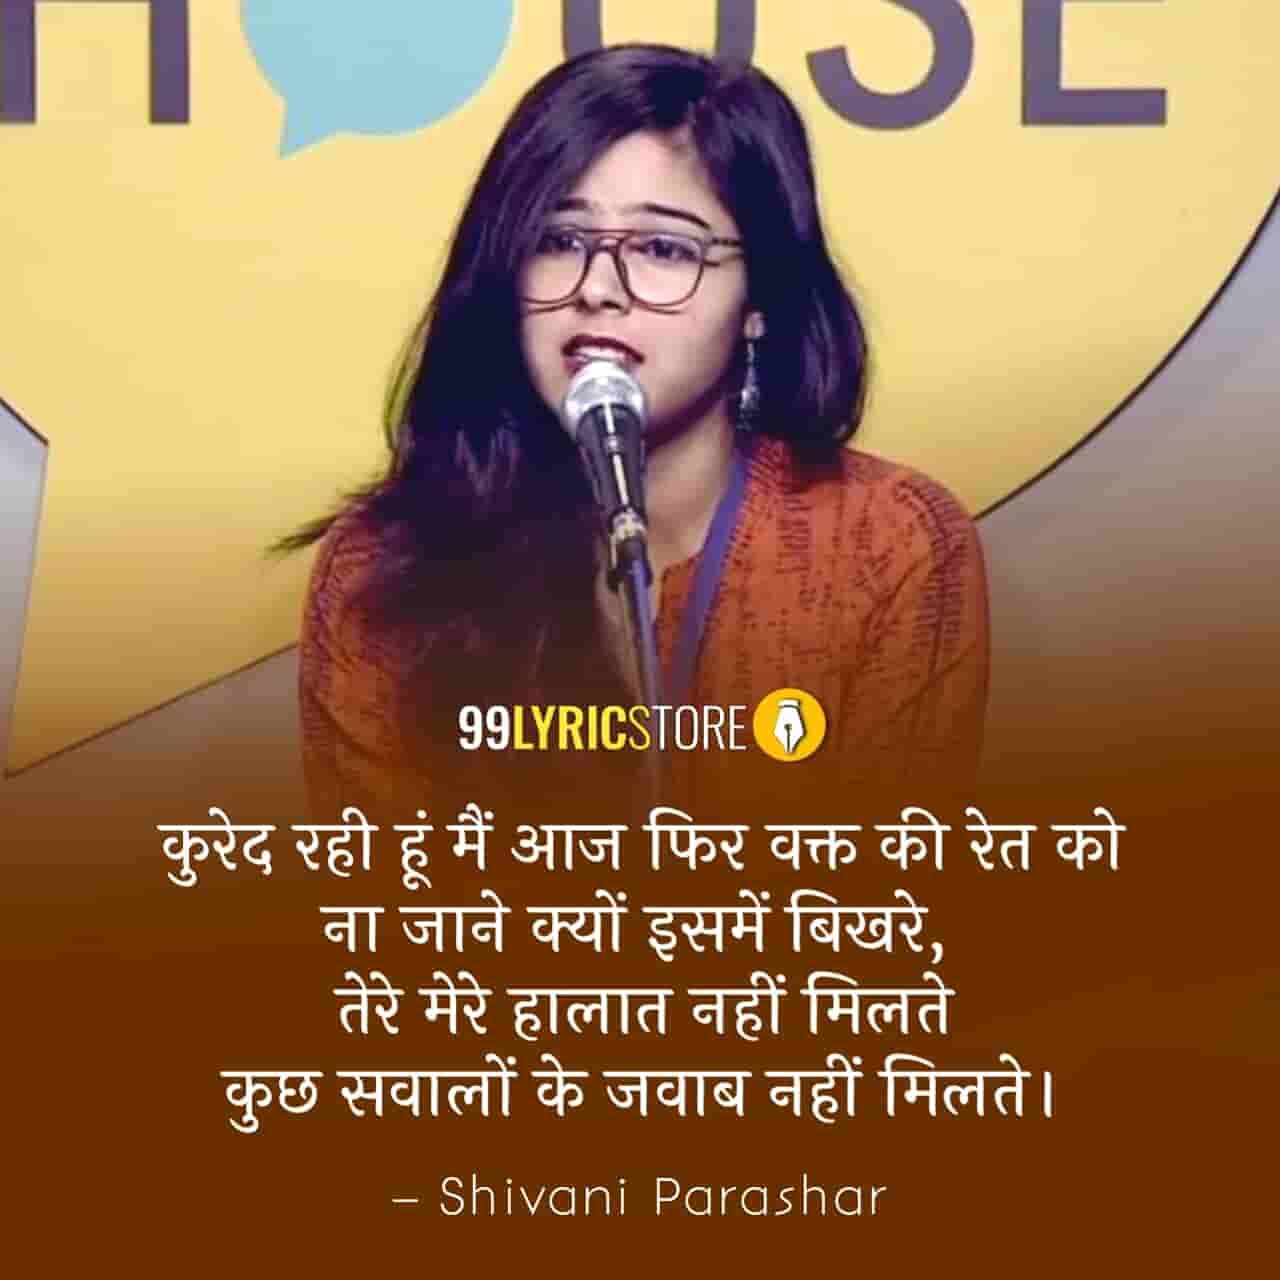 This beautiful Poetry 'Kuch Sawaalo Ke Jawaab Nahi Milte' has written and Performed by Shivani Parashar on The Social House's Plateform.